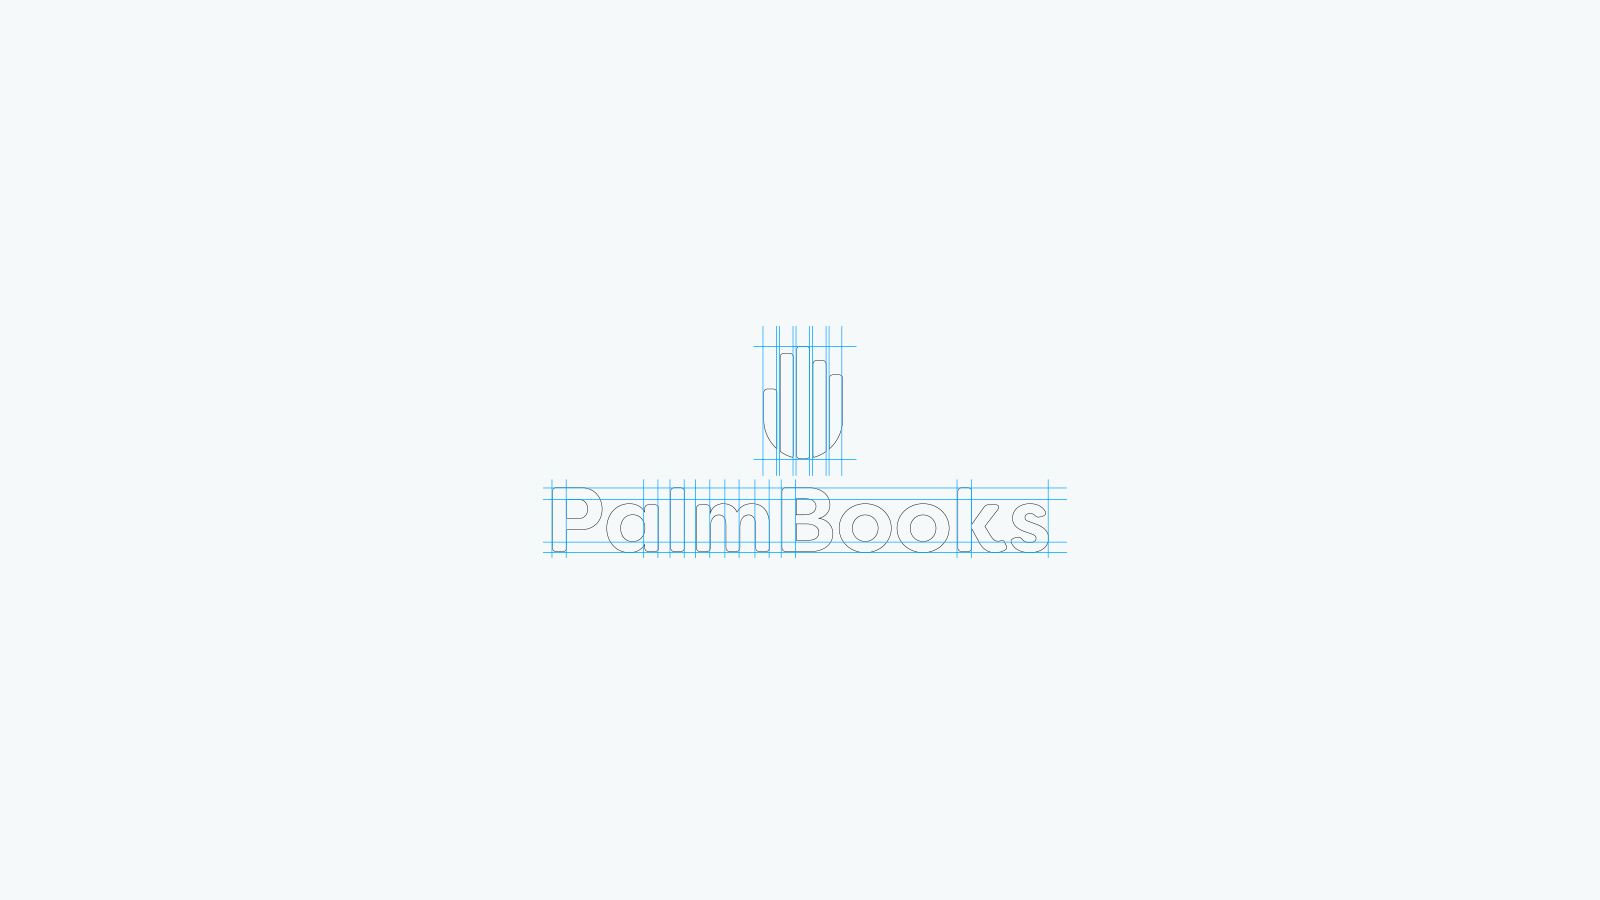 Palm Books 1.jpg